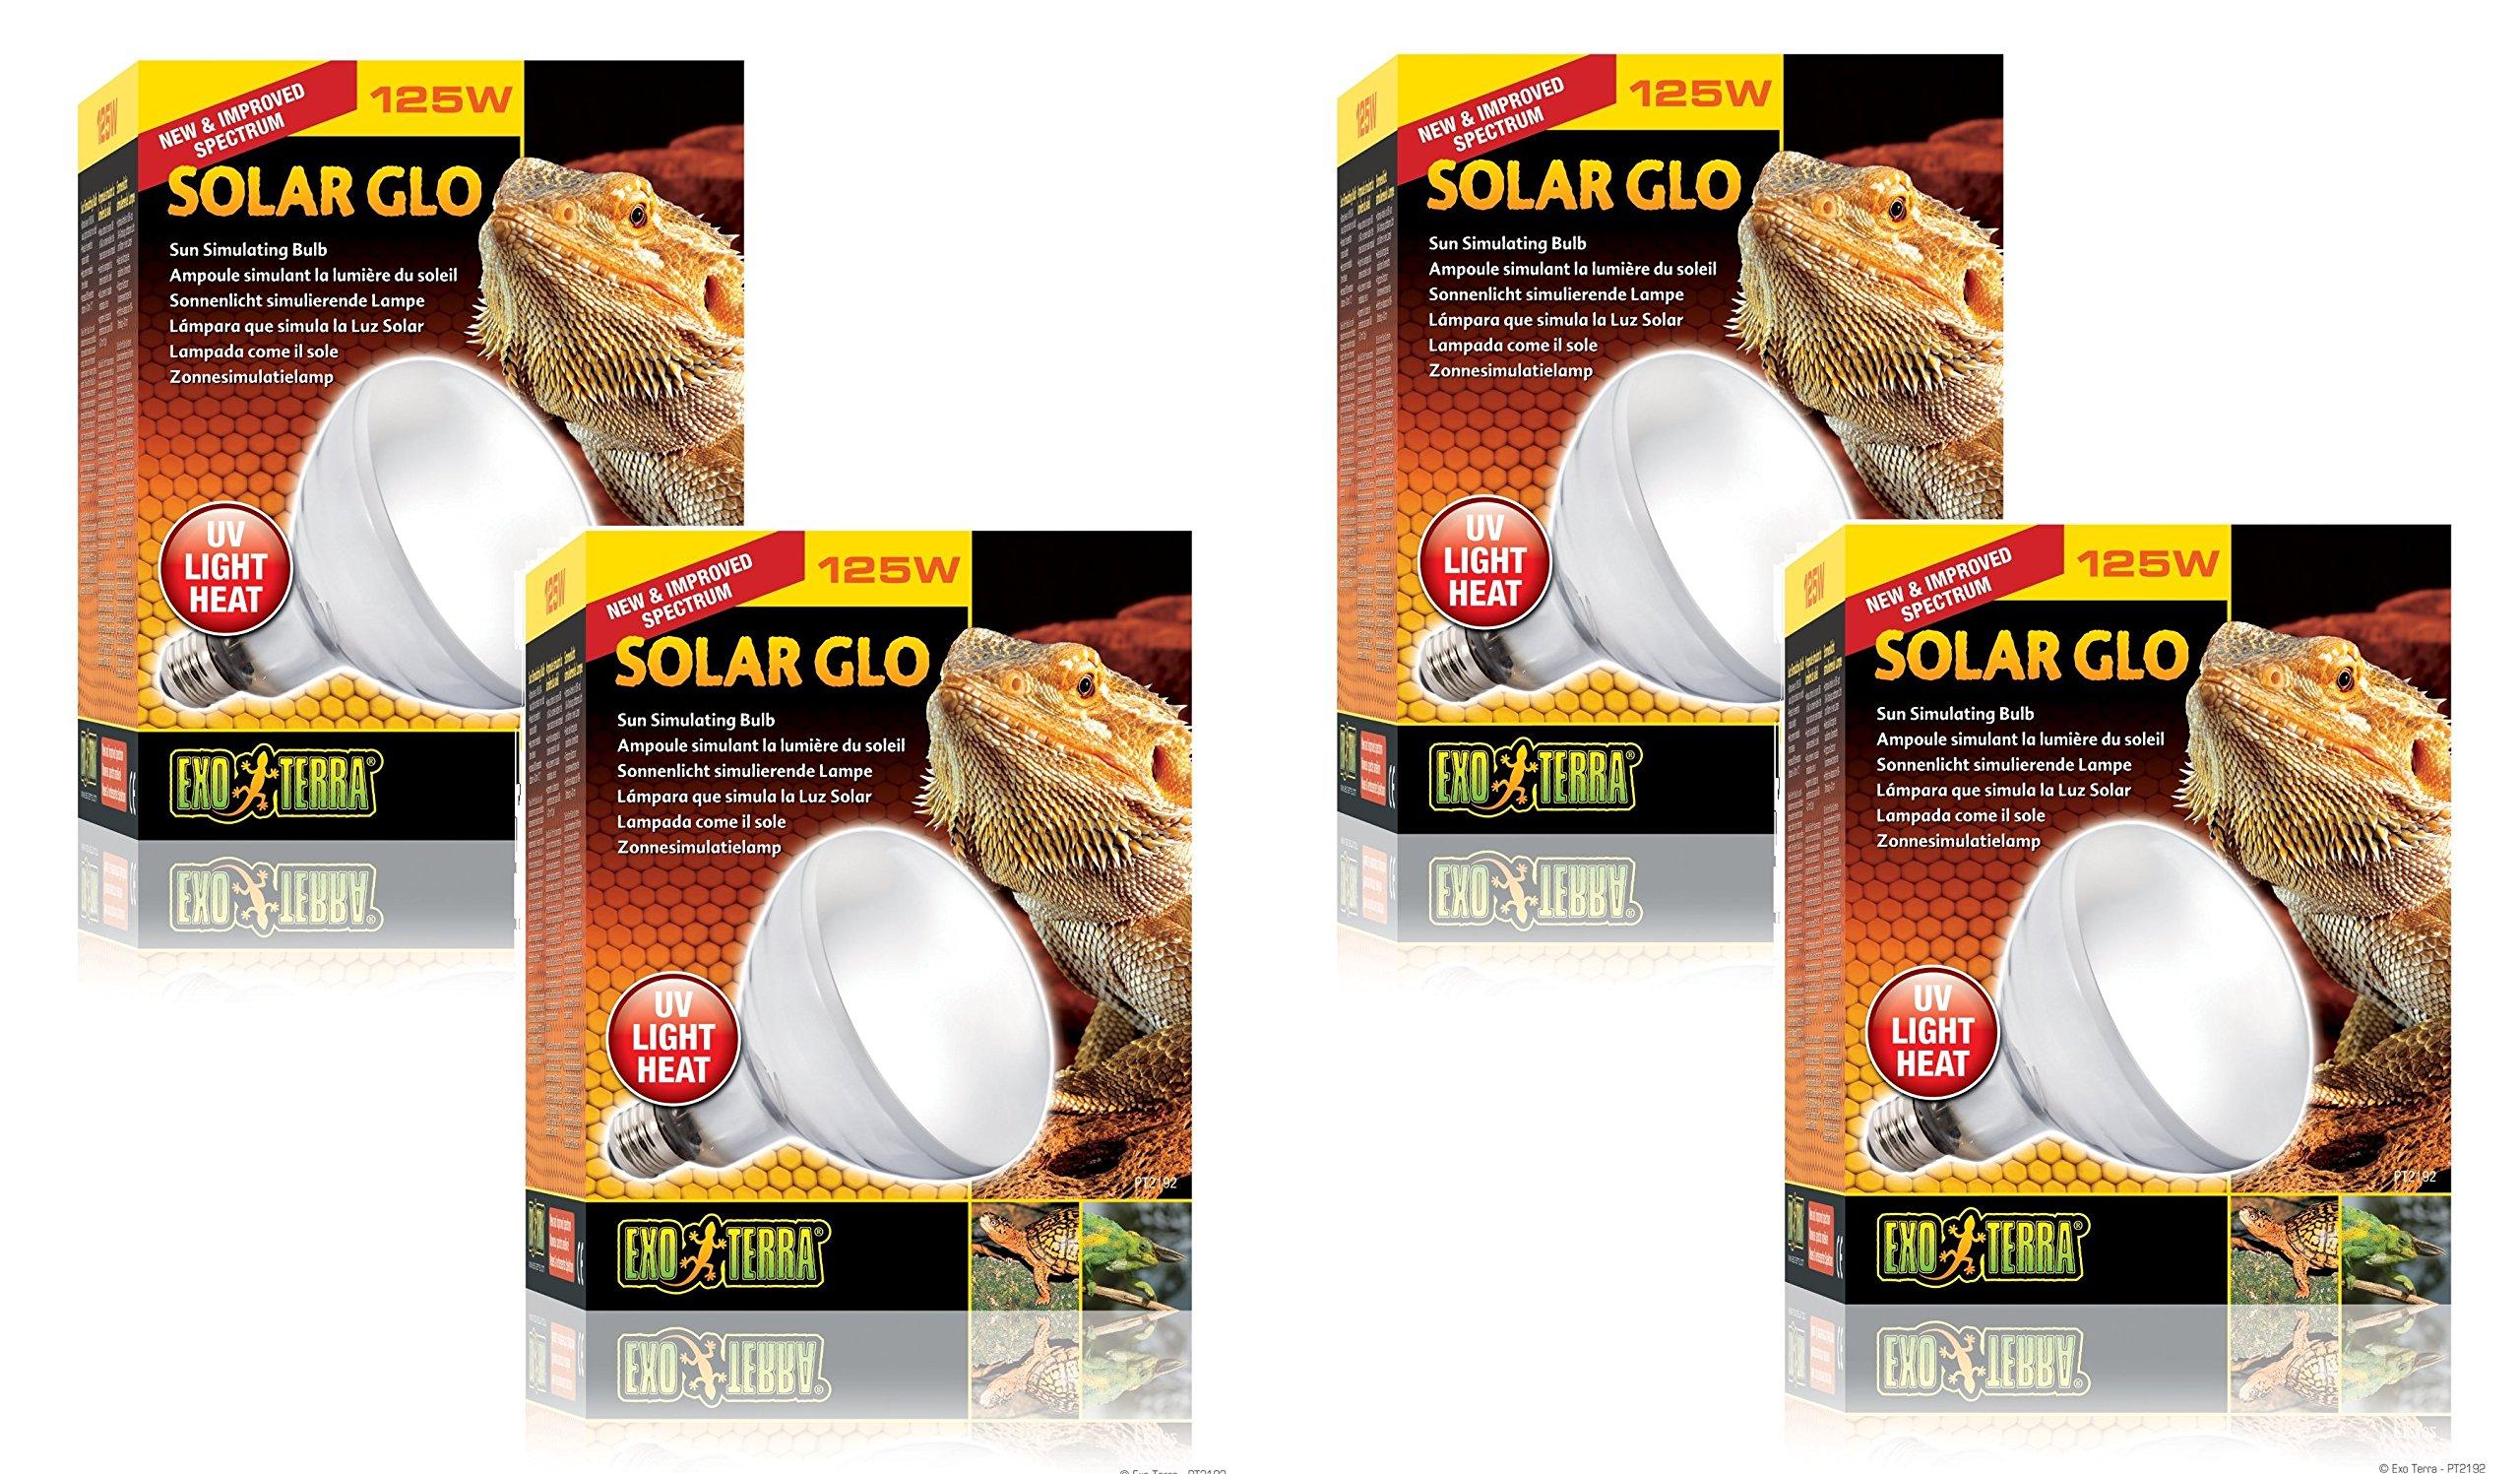 (4 Pack) Exo Terra Solar-Glo High Intensity Self-Ballasted Uv/Heat Mercury Vapor Lamp, 125 Watt